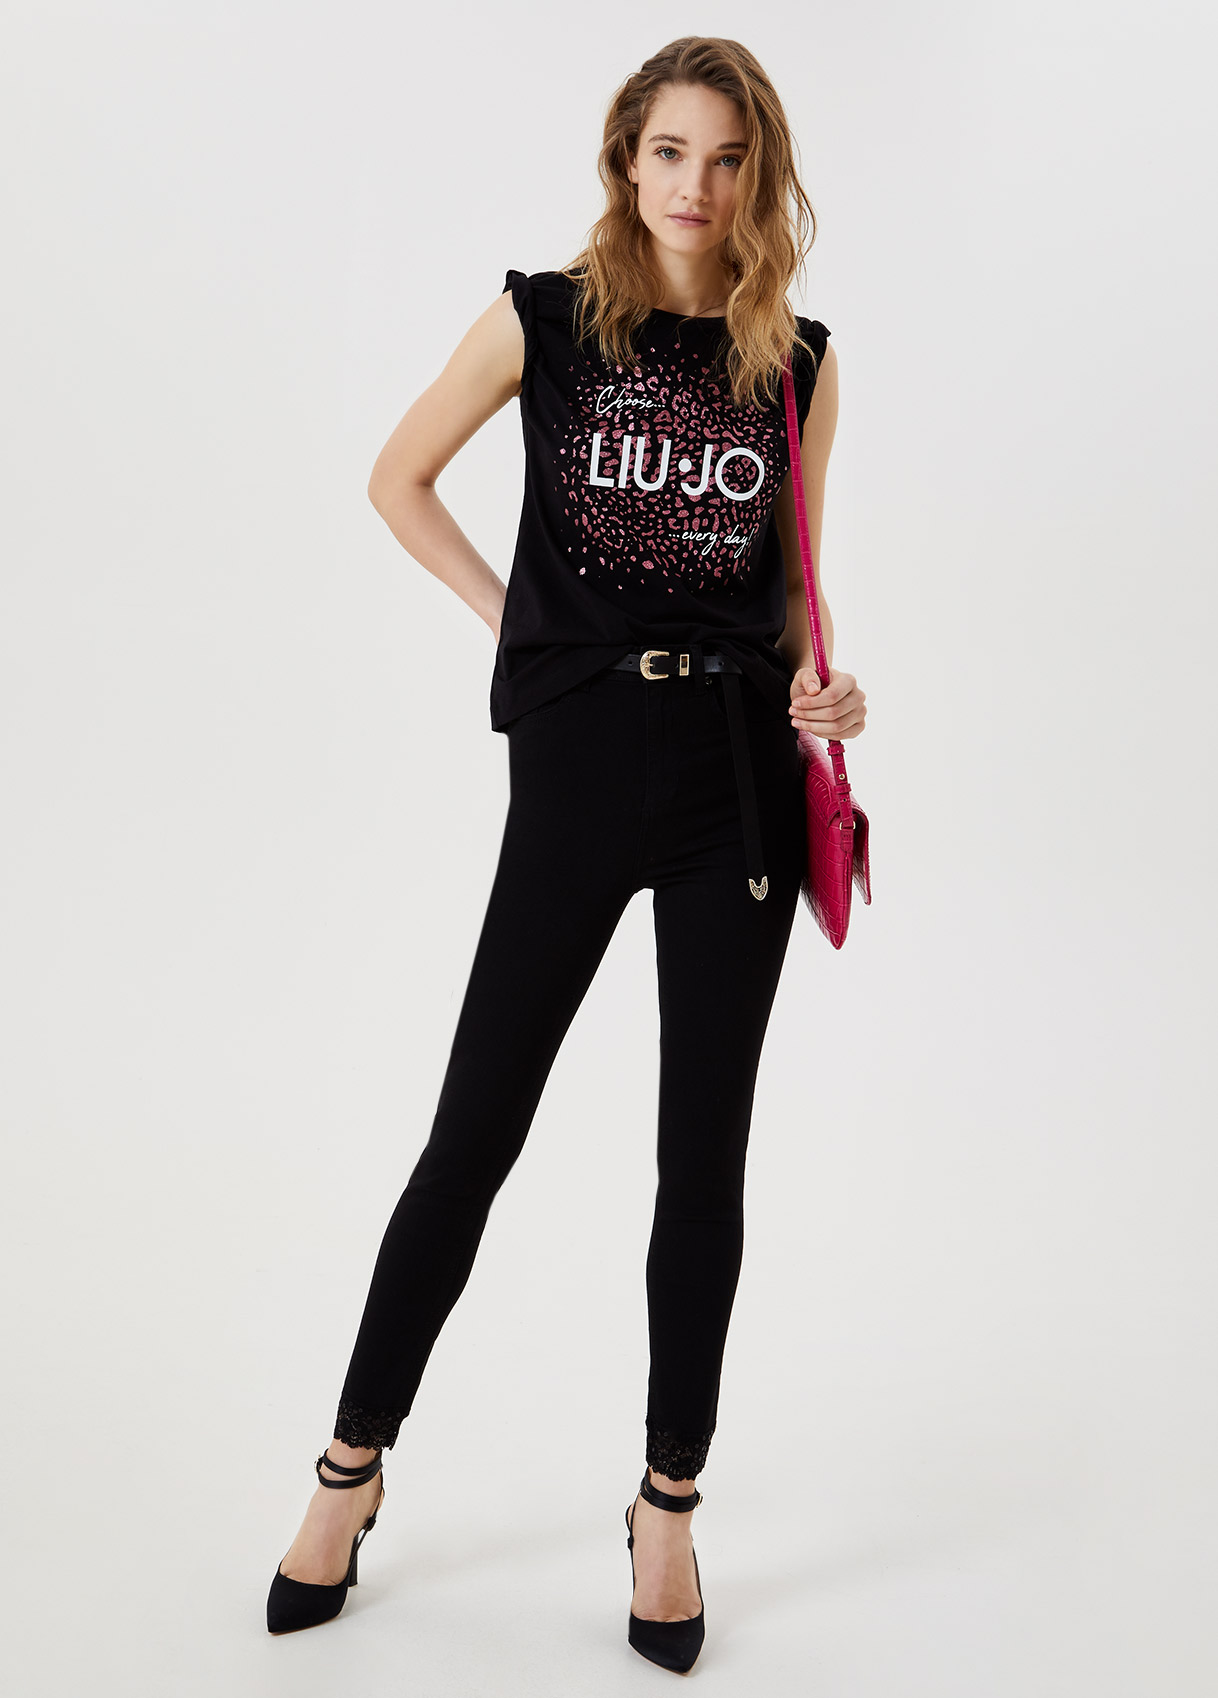 jeans ideal super LIU JO | Jeans | UA1060D418878158